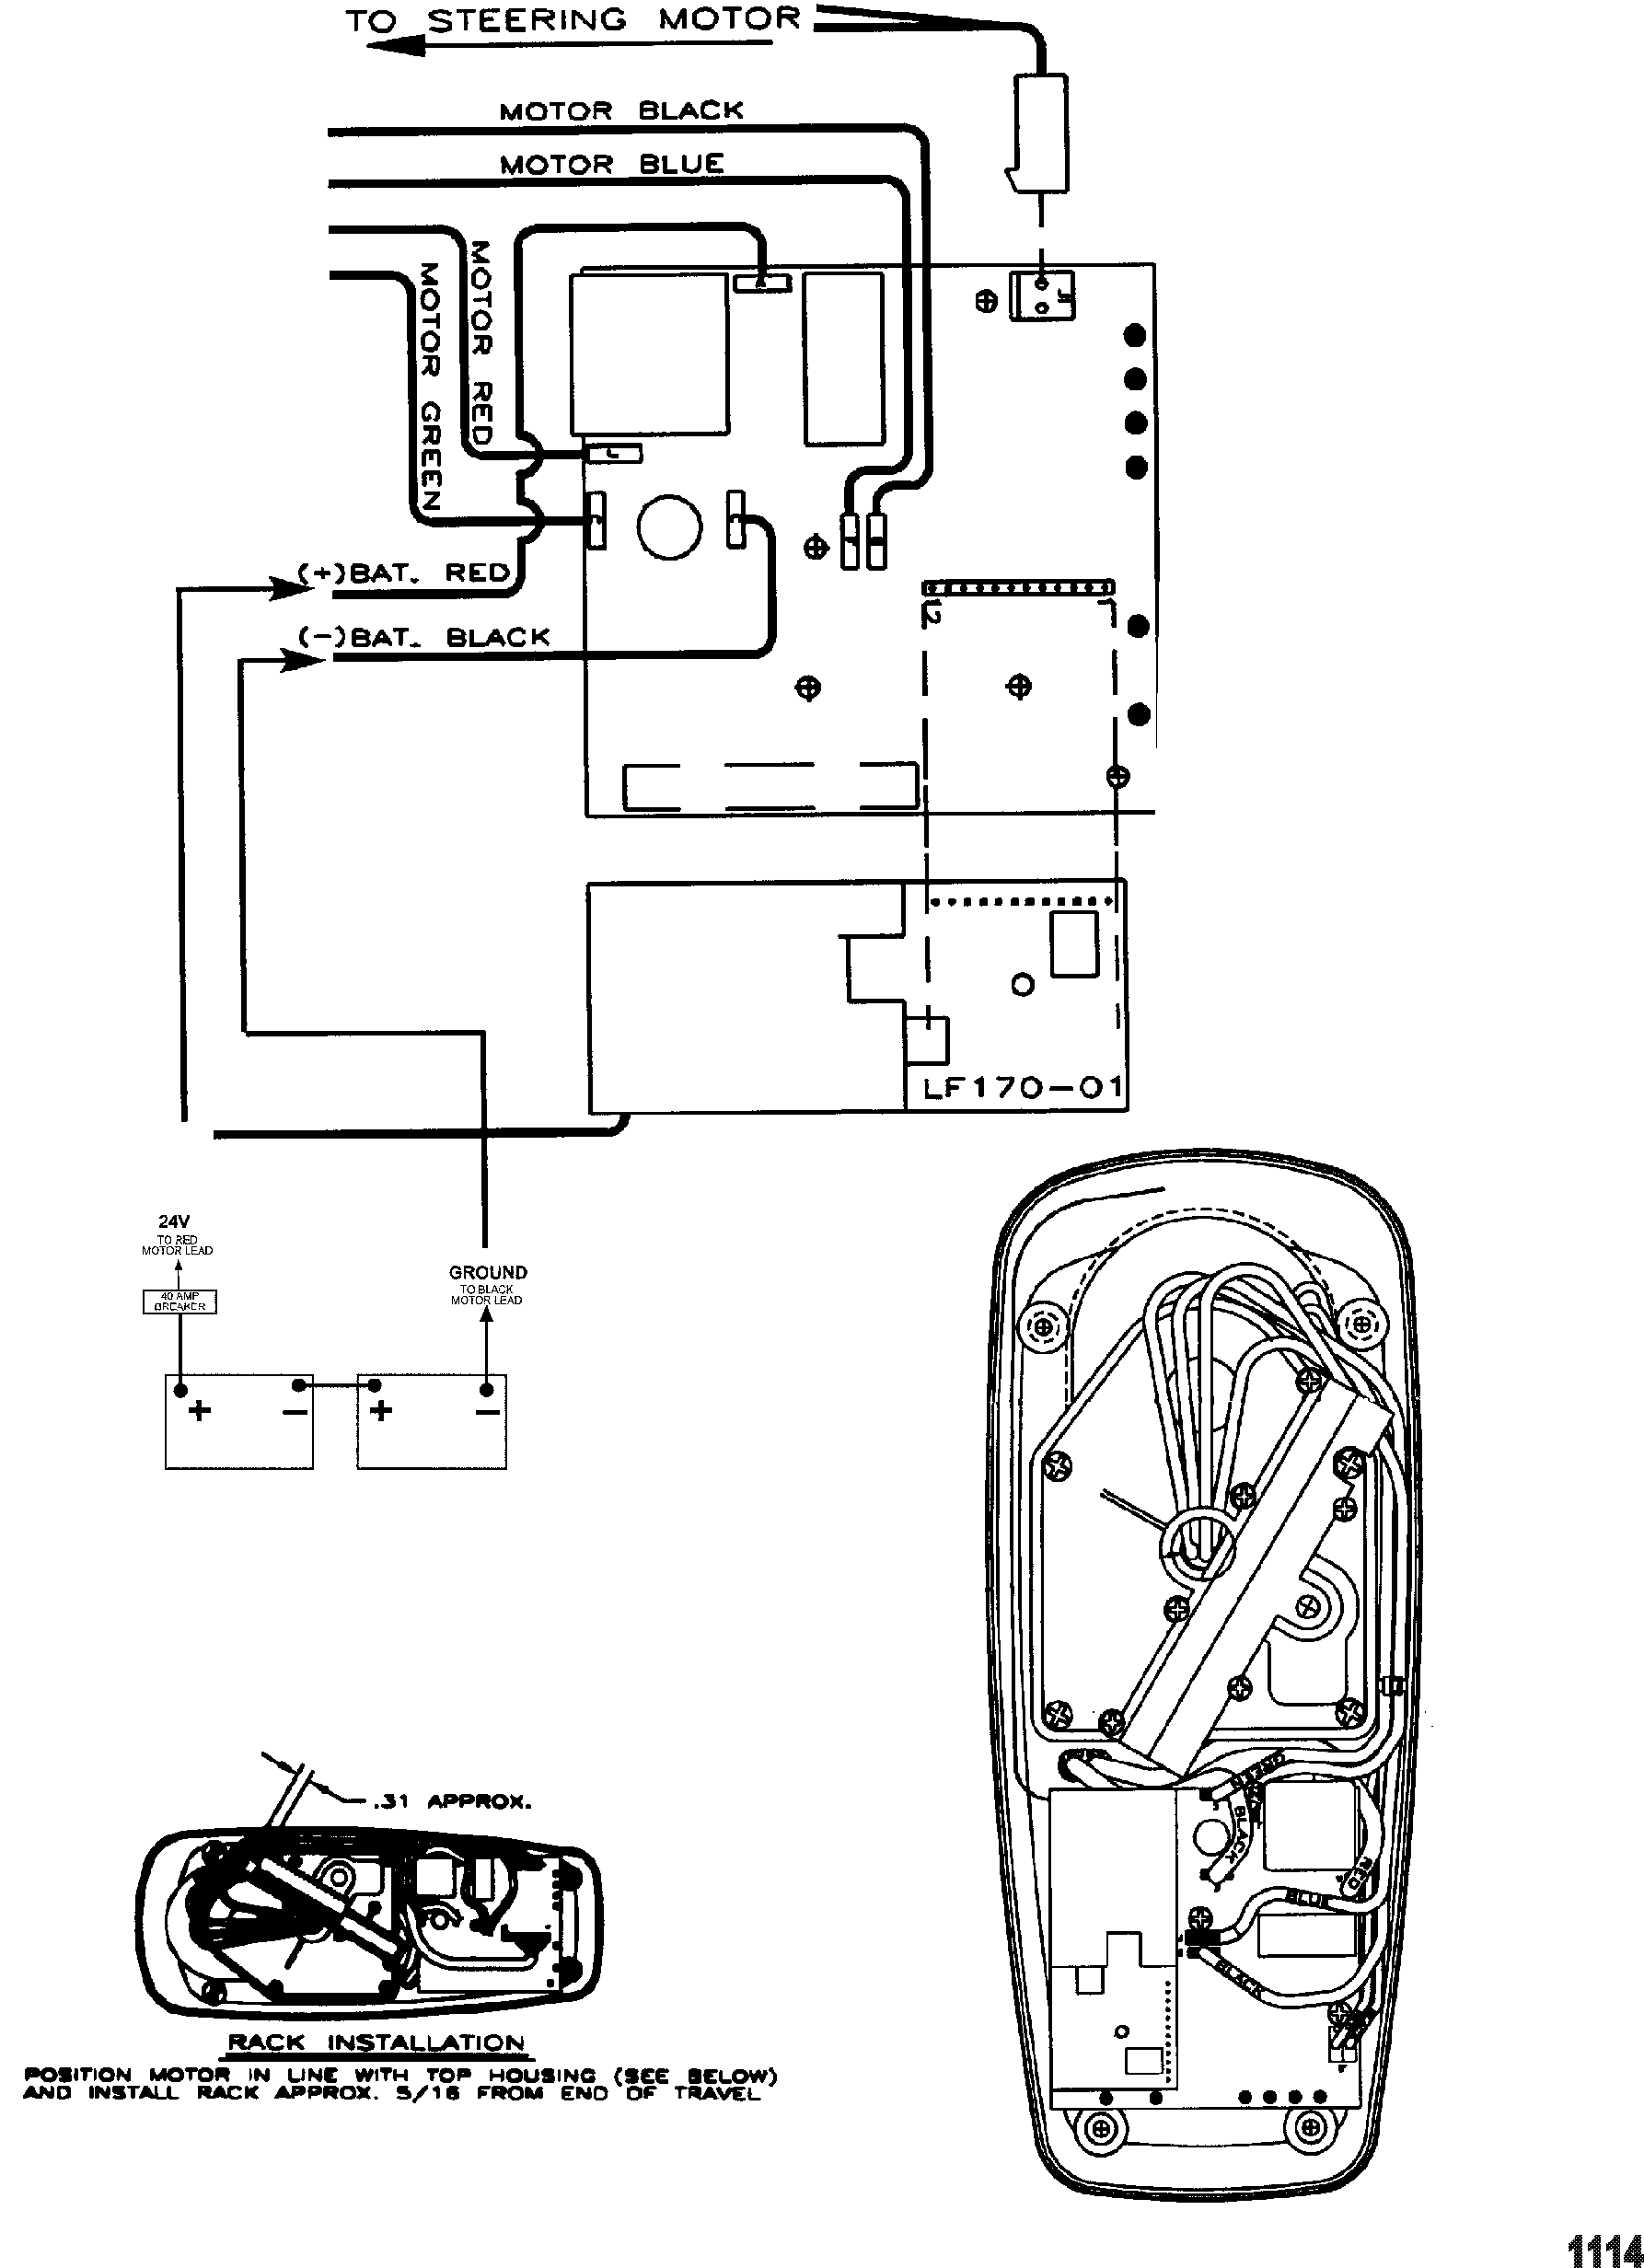 Motorguide Trolling Motor Wiring Diagram : Plug wiring diagram v trolling motor motorguide